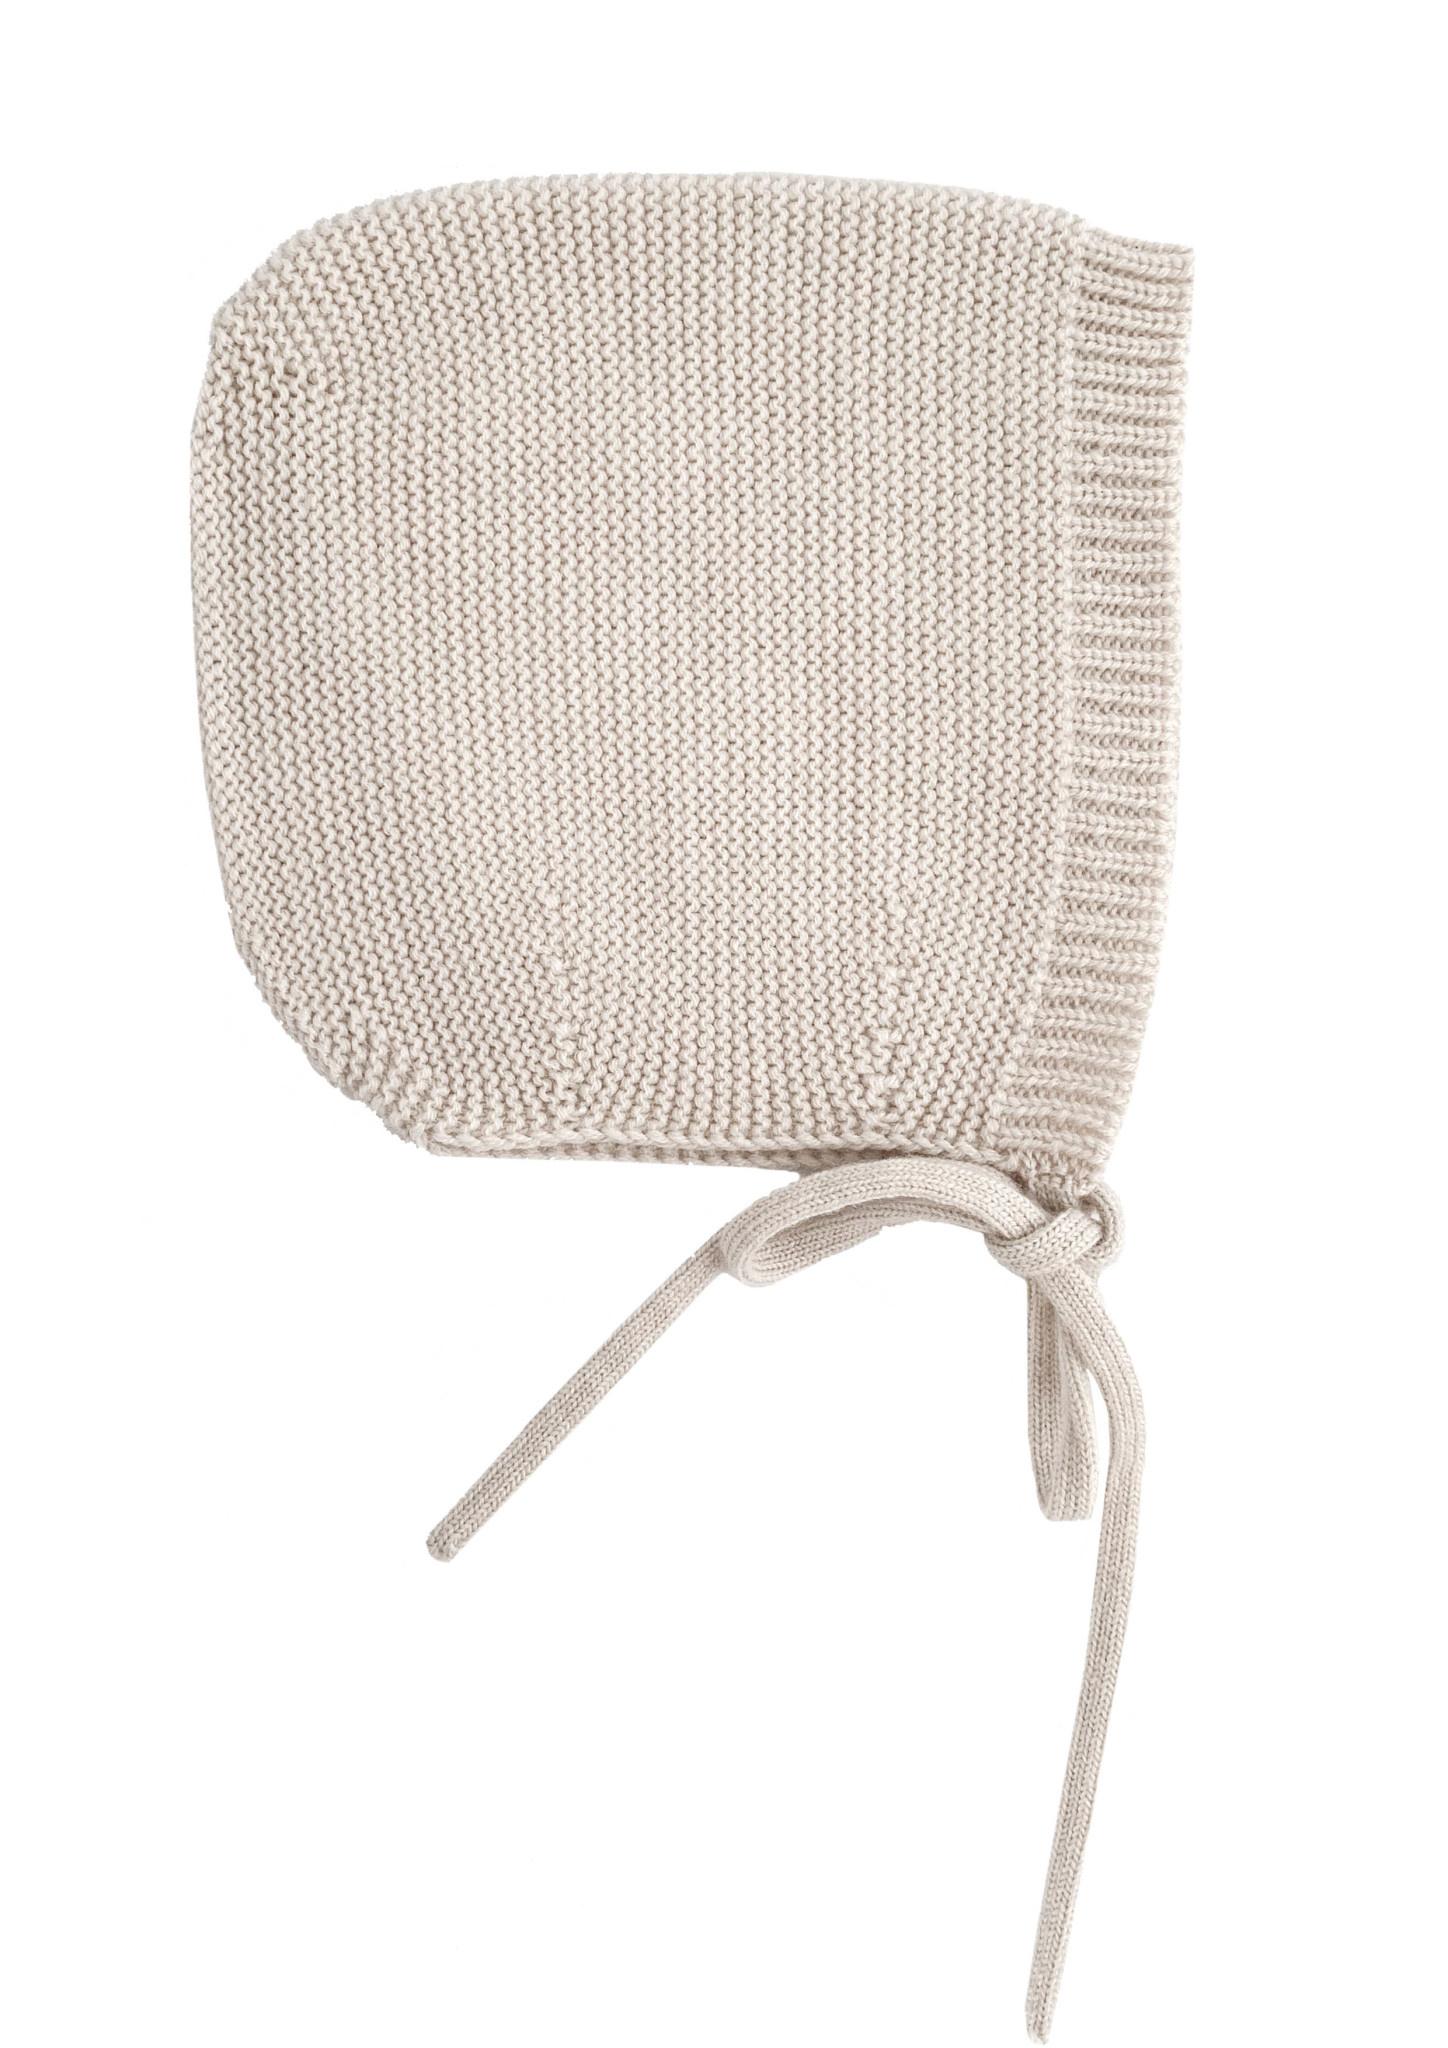 Bonnet dolly off-white-1